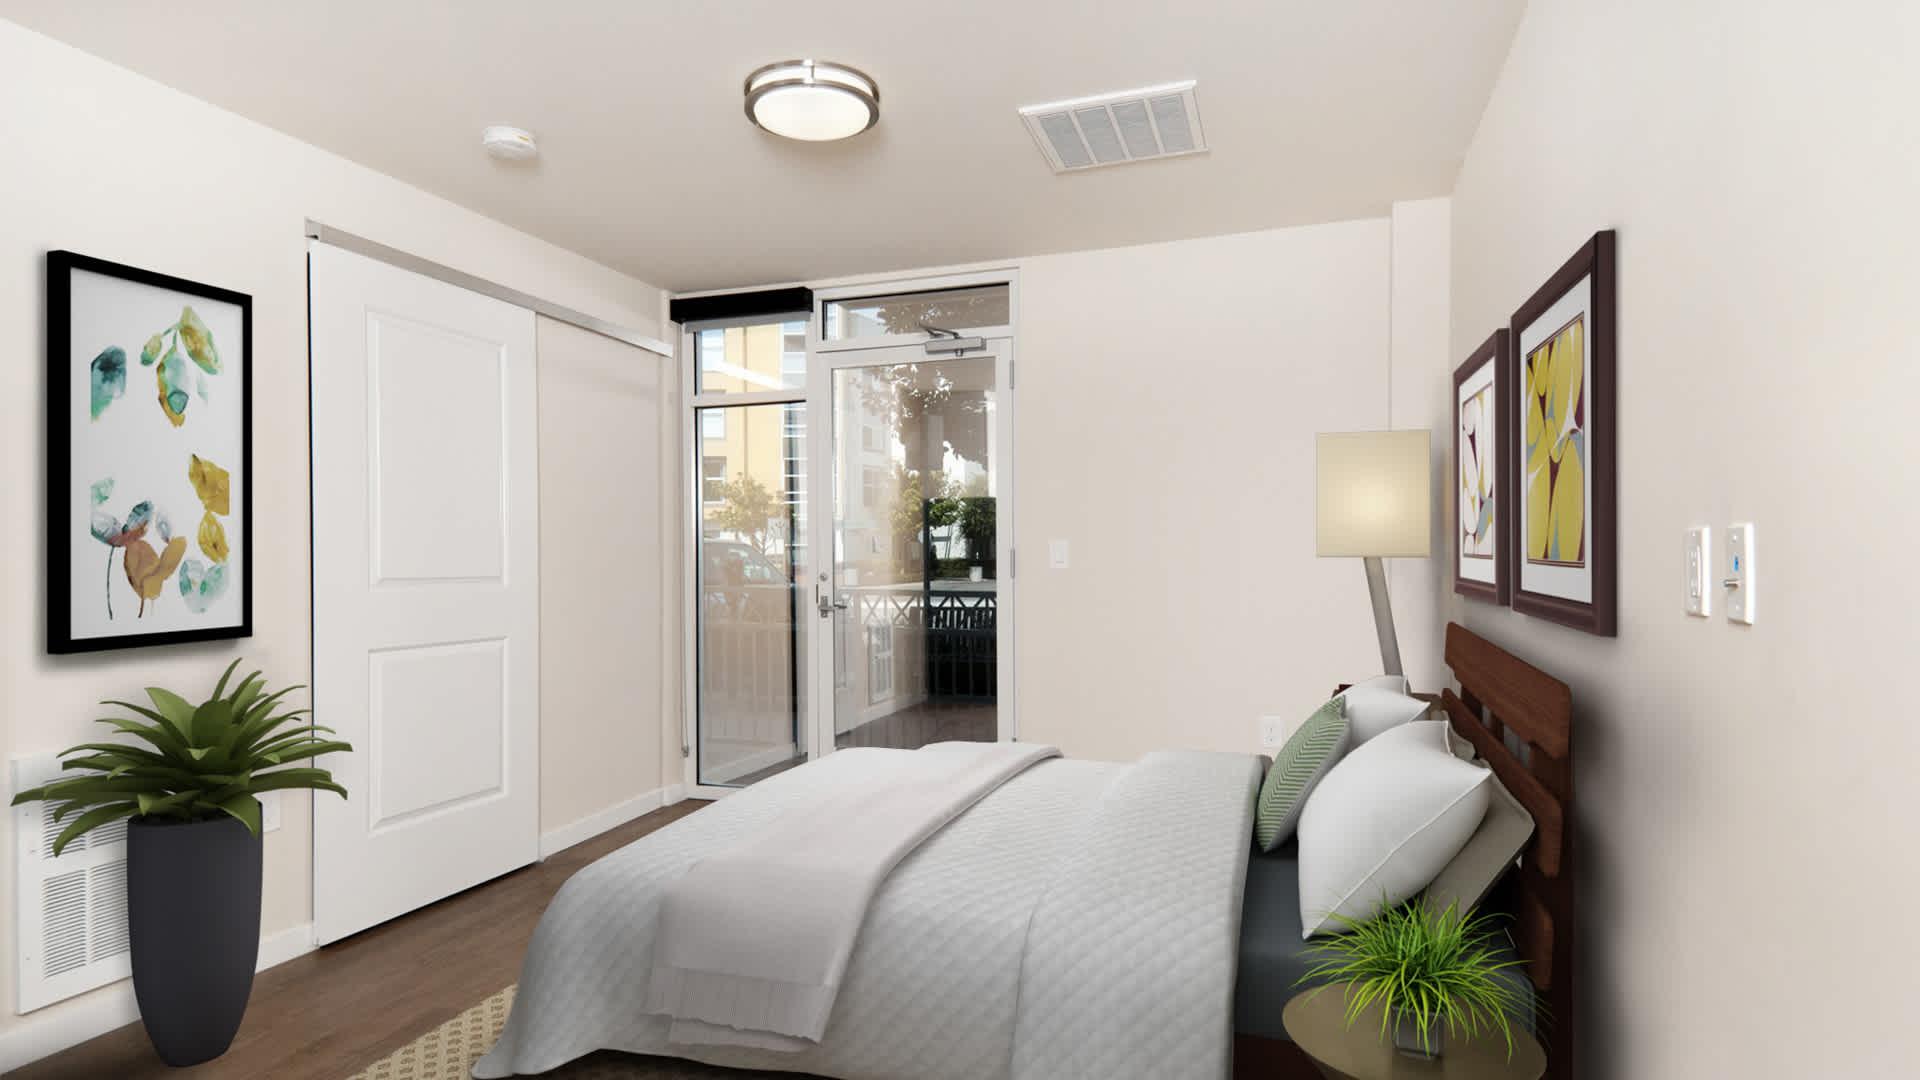 South City Station Housing-Sample Image of South San Francisco CA Nurse Home